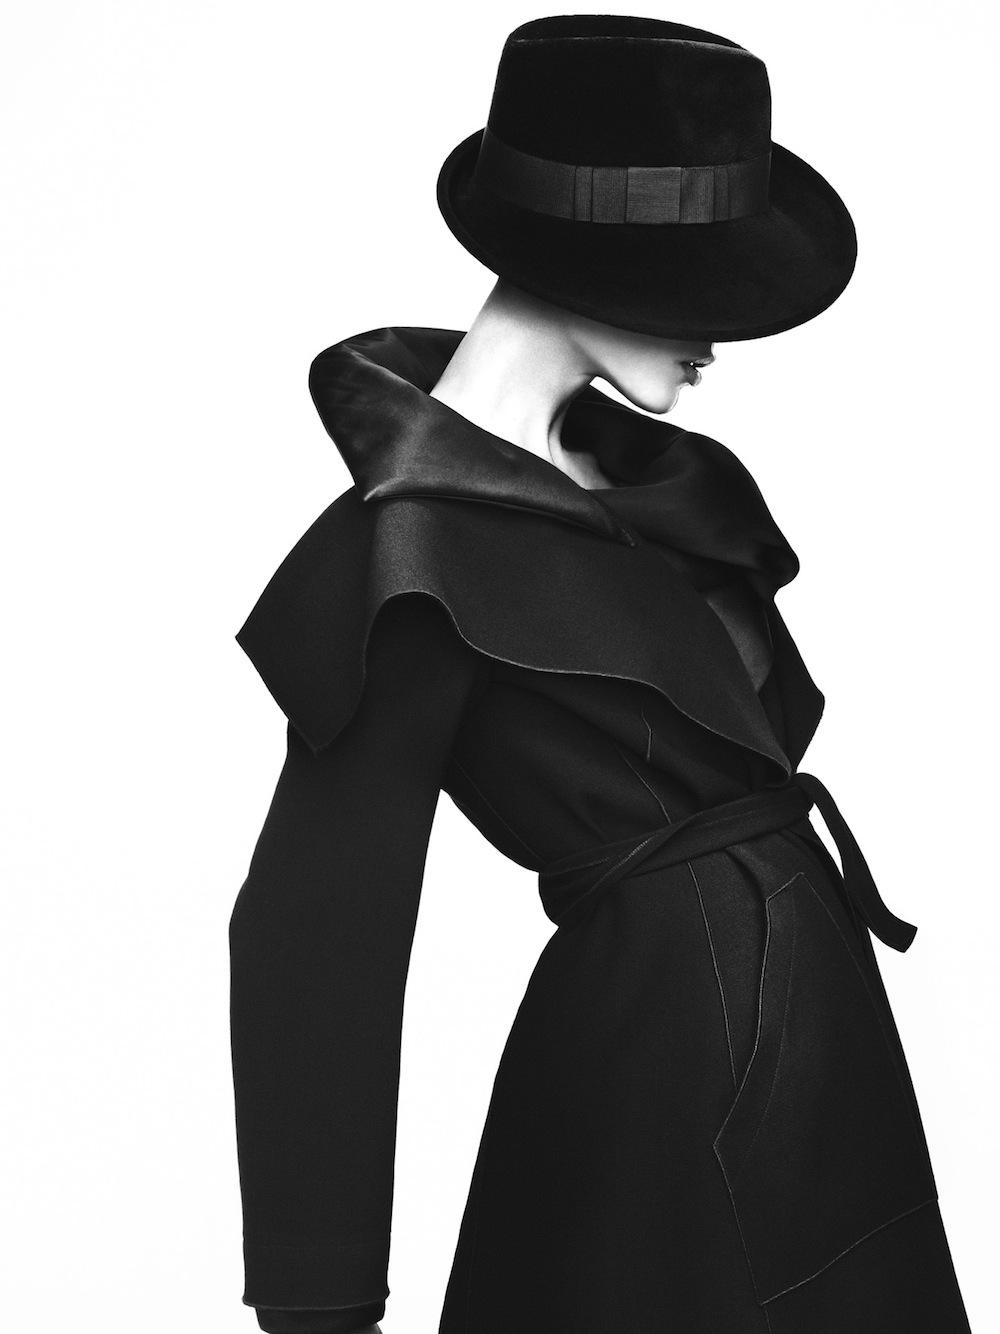 Giorgio Armani | 2012/13 Autumn/Winter advertising campaign | Model: Aymeline Valade